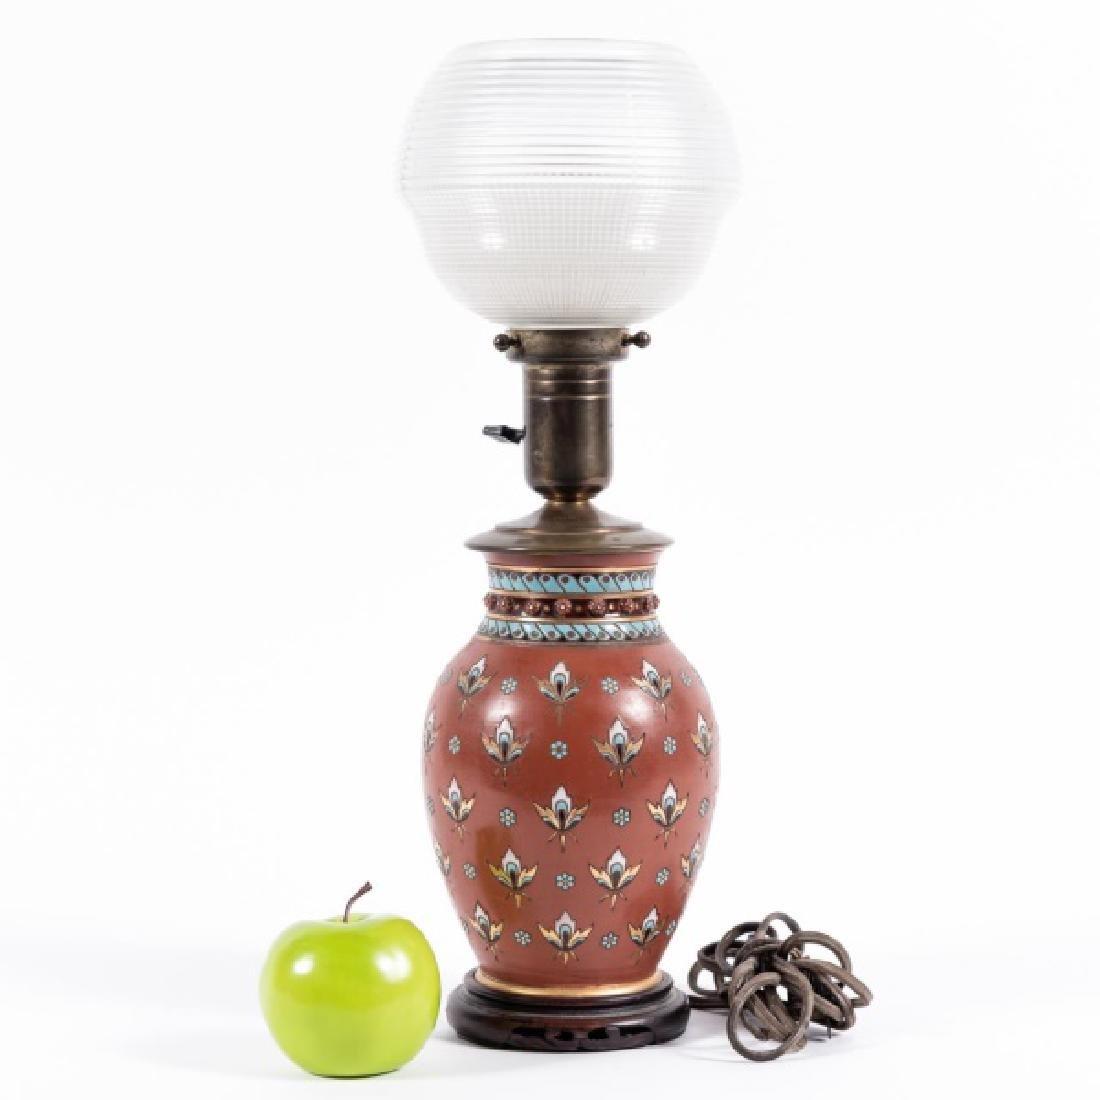 Doulton Lambeth Silicon Vase Mounted as a Lamp